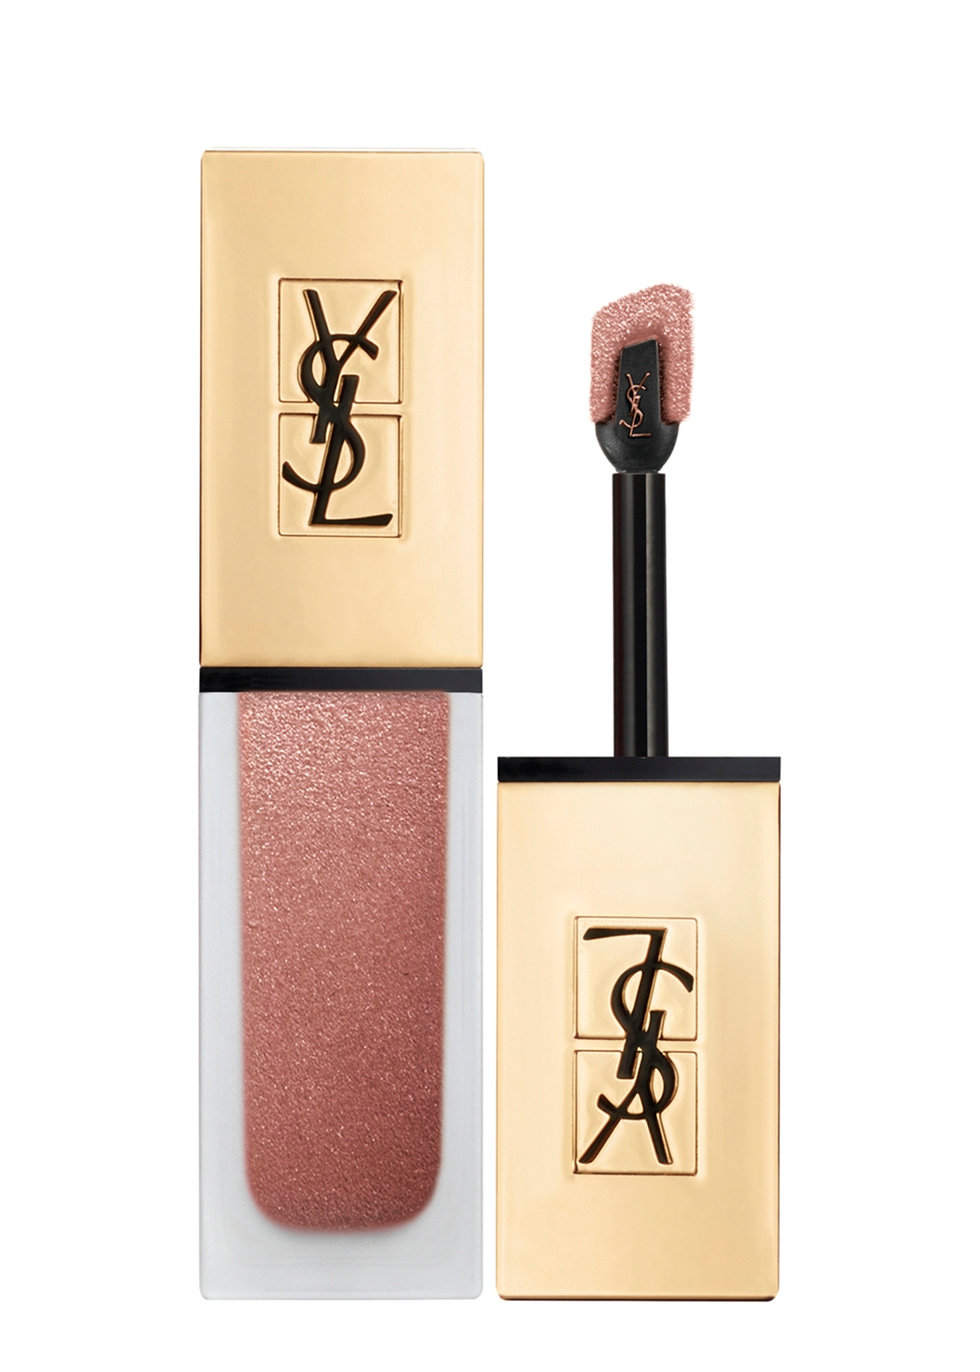 Tatouage Couture Metallic Lip Stain - Yves Saint Laurent